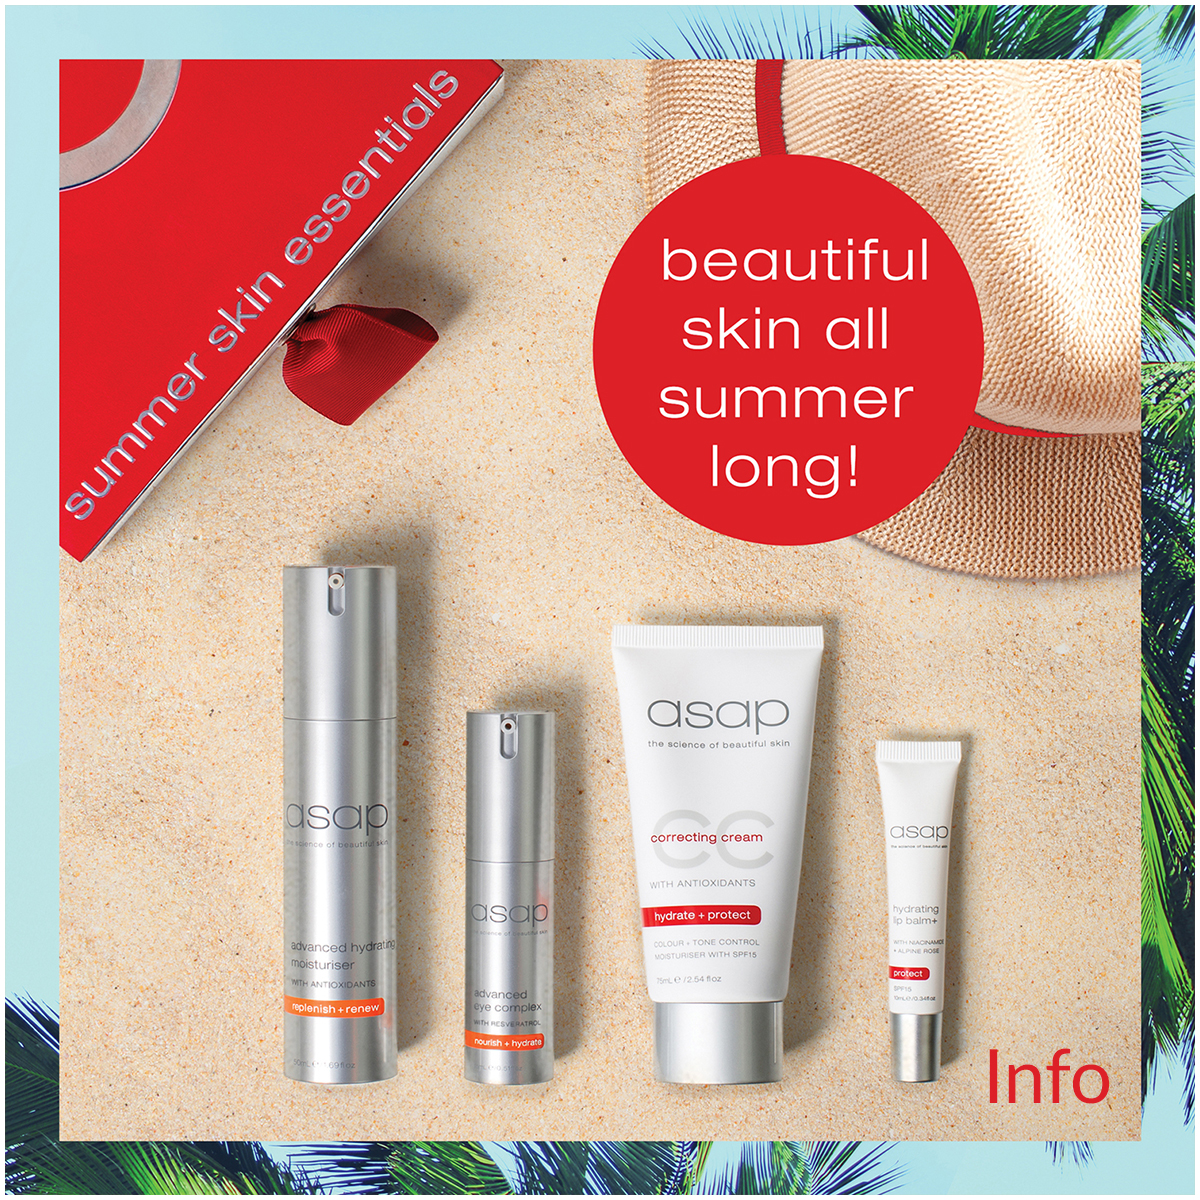 asap summer skin essentials